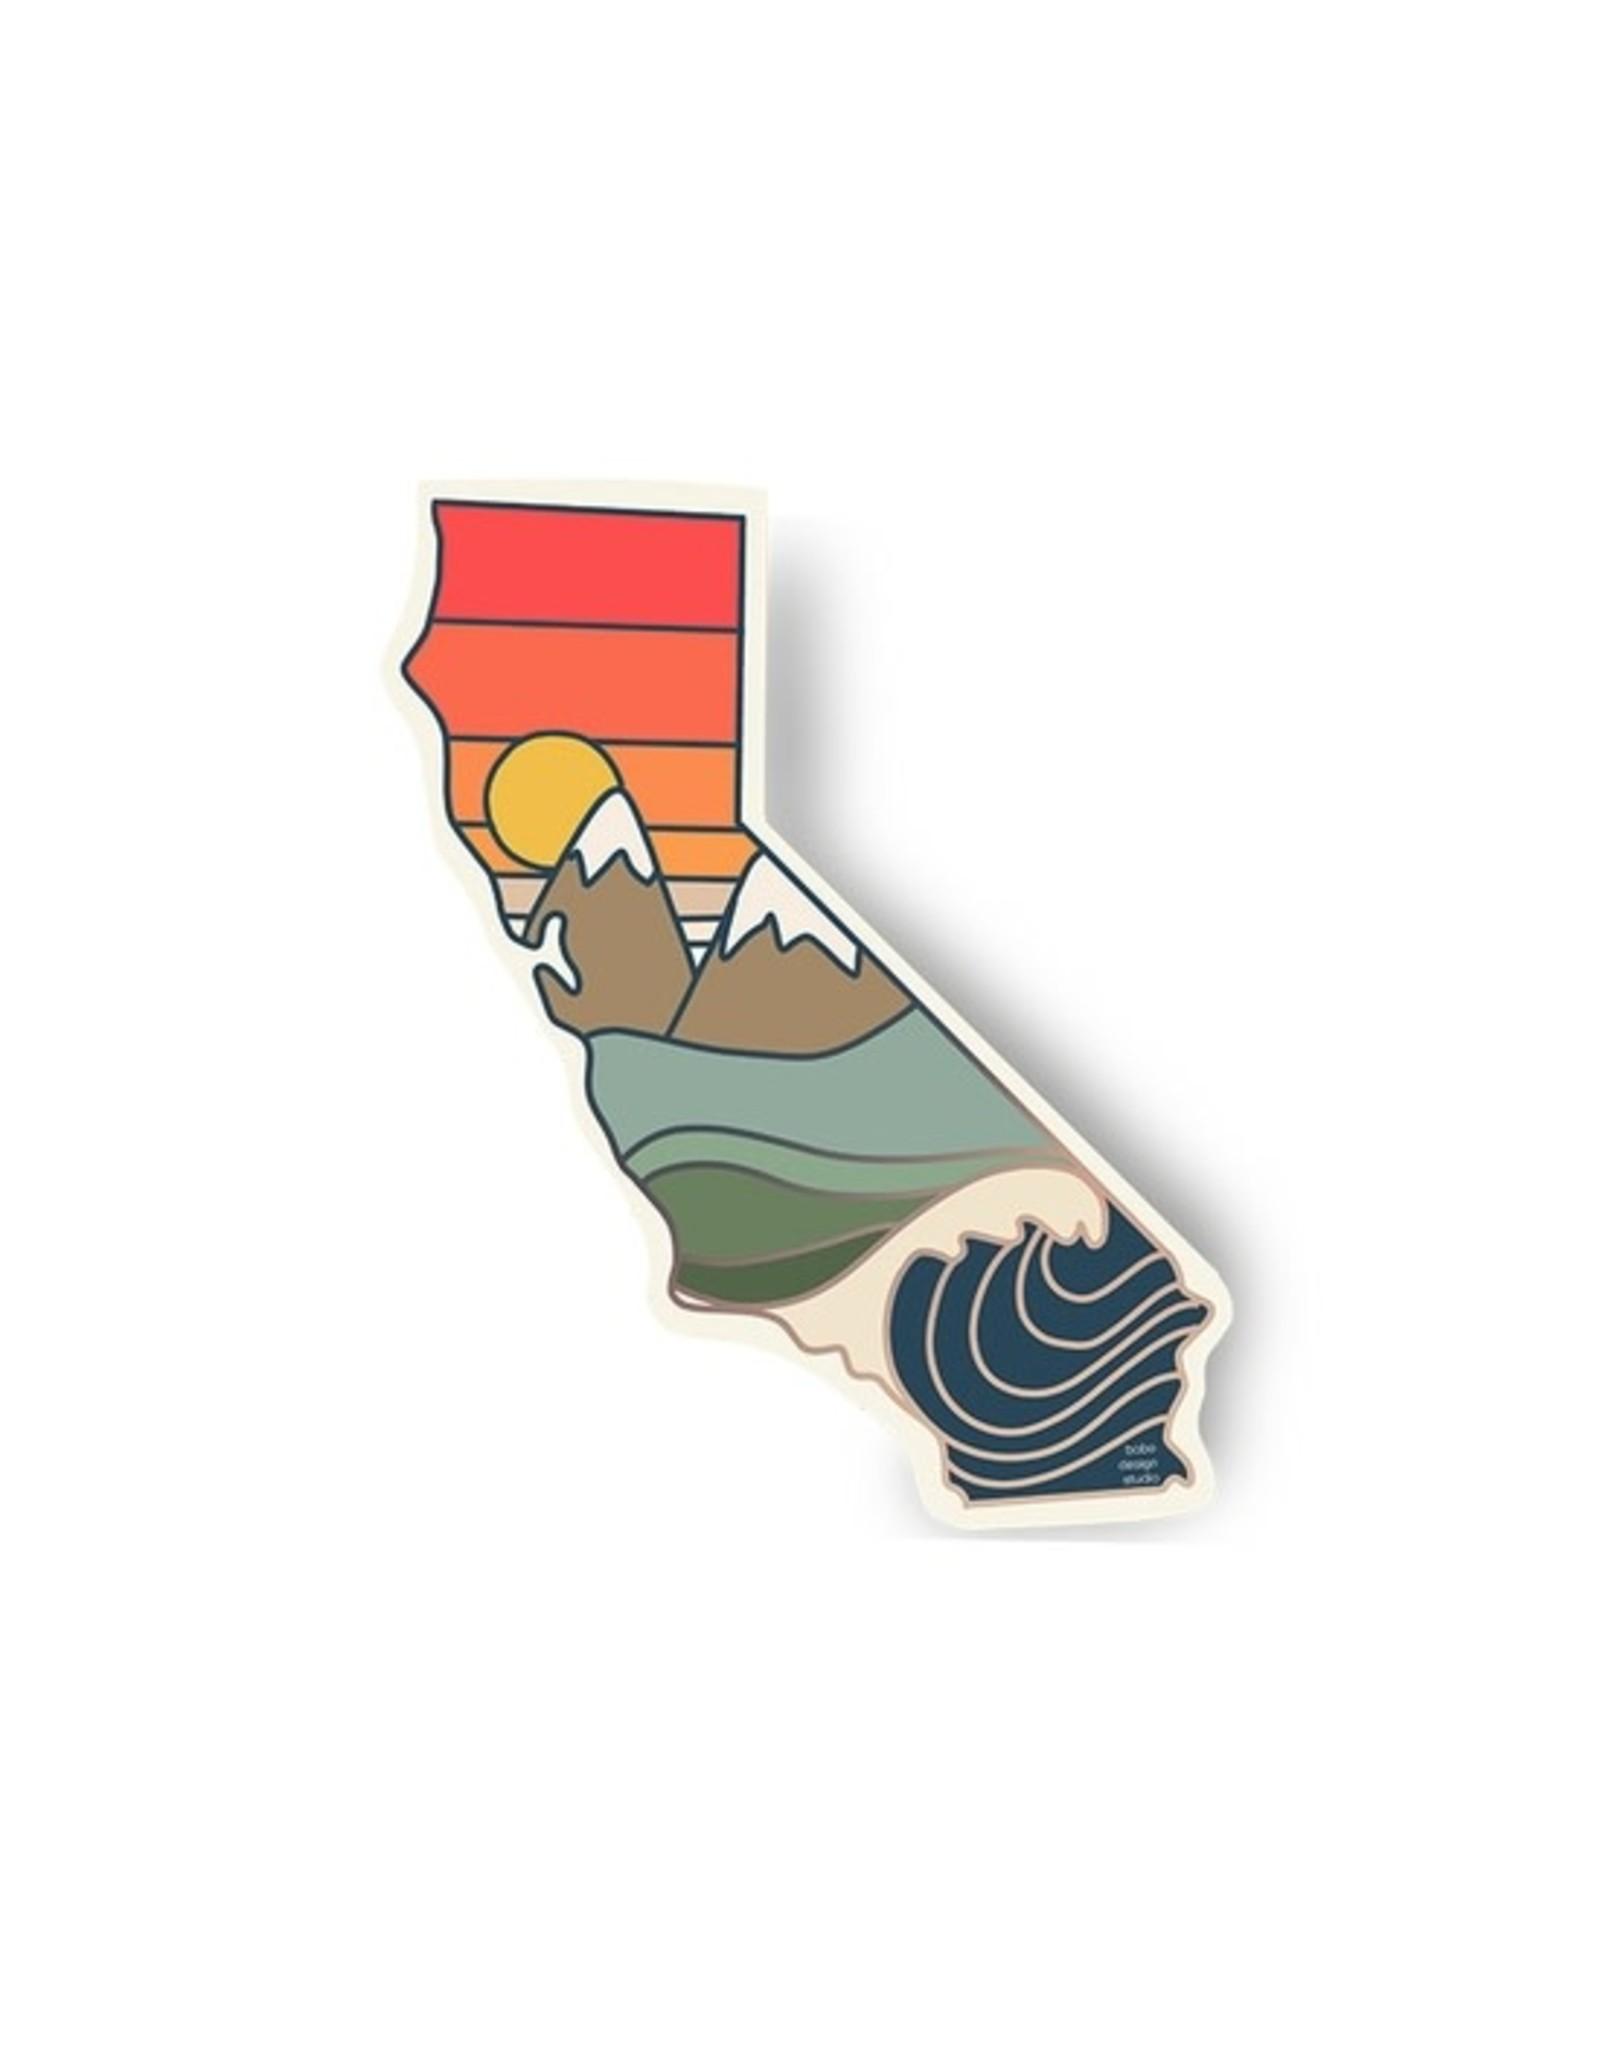 Bobo Design Studio Seasonal Golden State Sticker